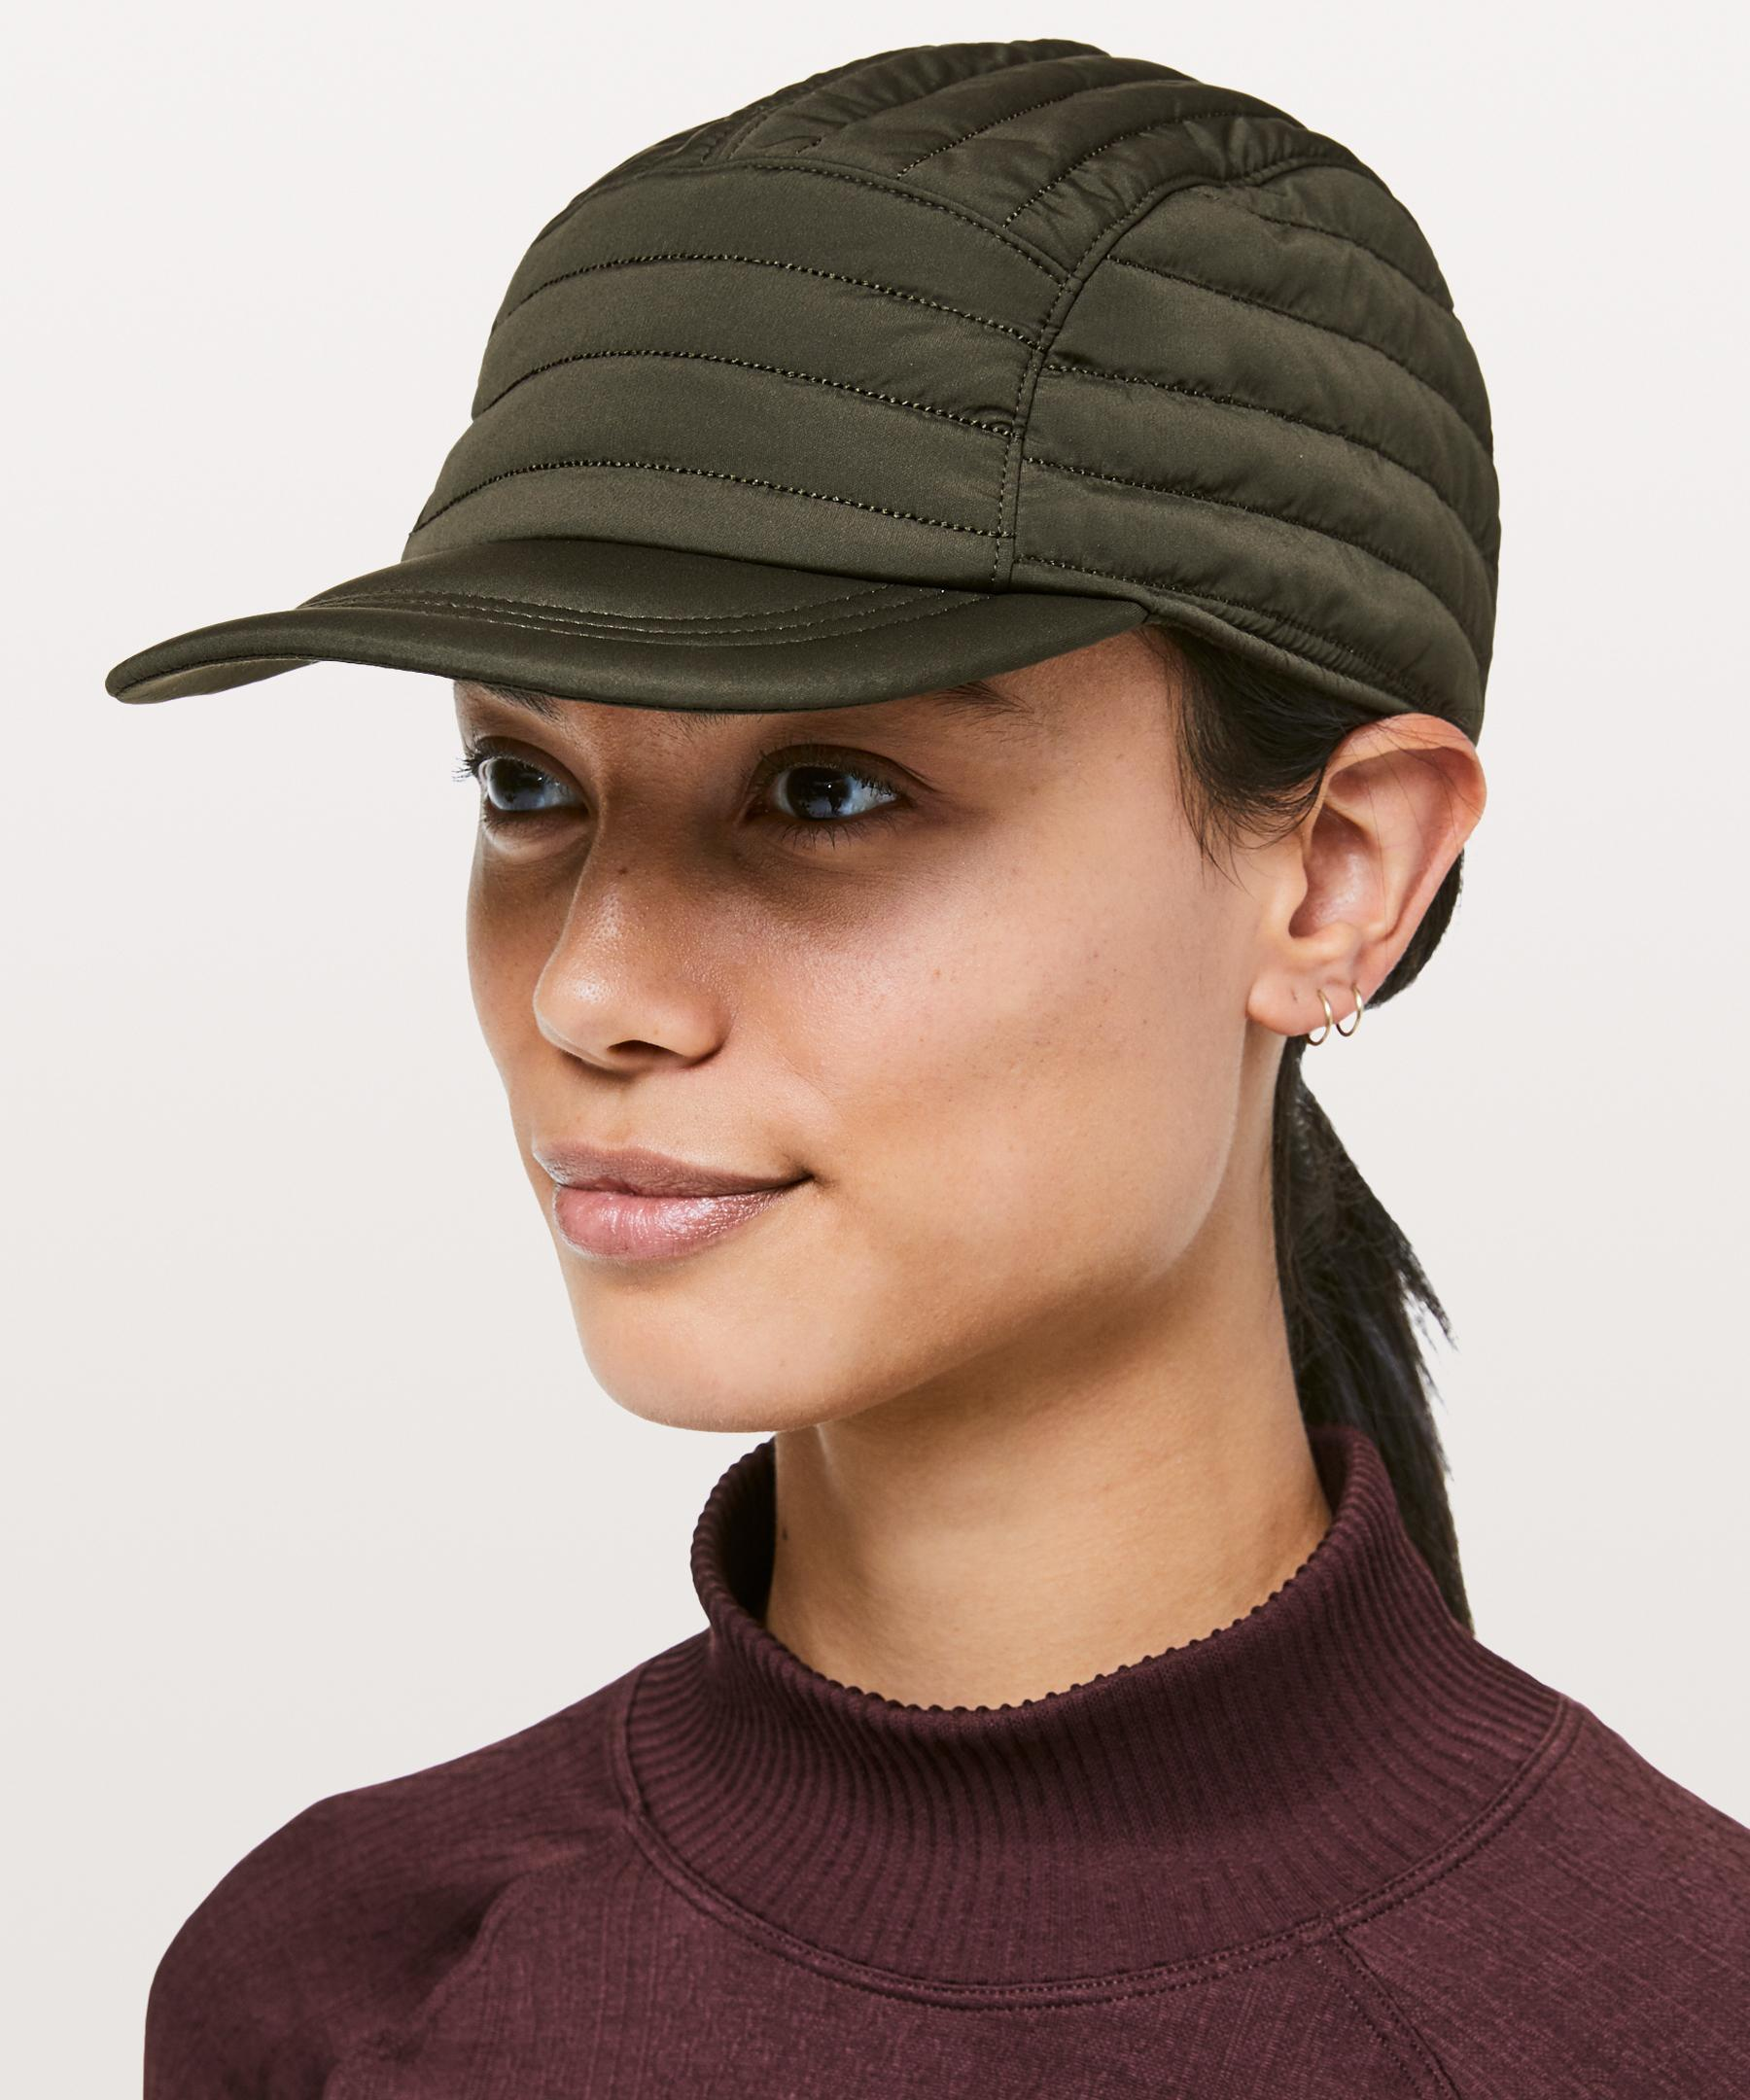 30eac7072 lululemon athletica Pinnacle Warmth Hat in Green for Men - Lyst